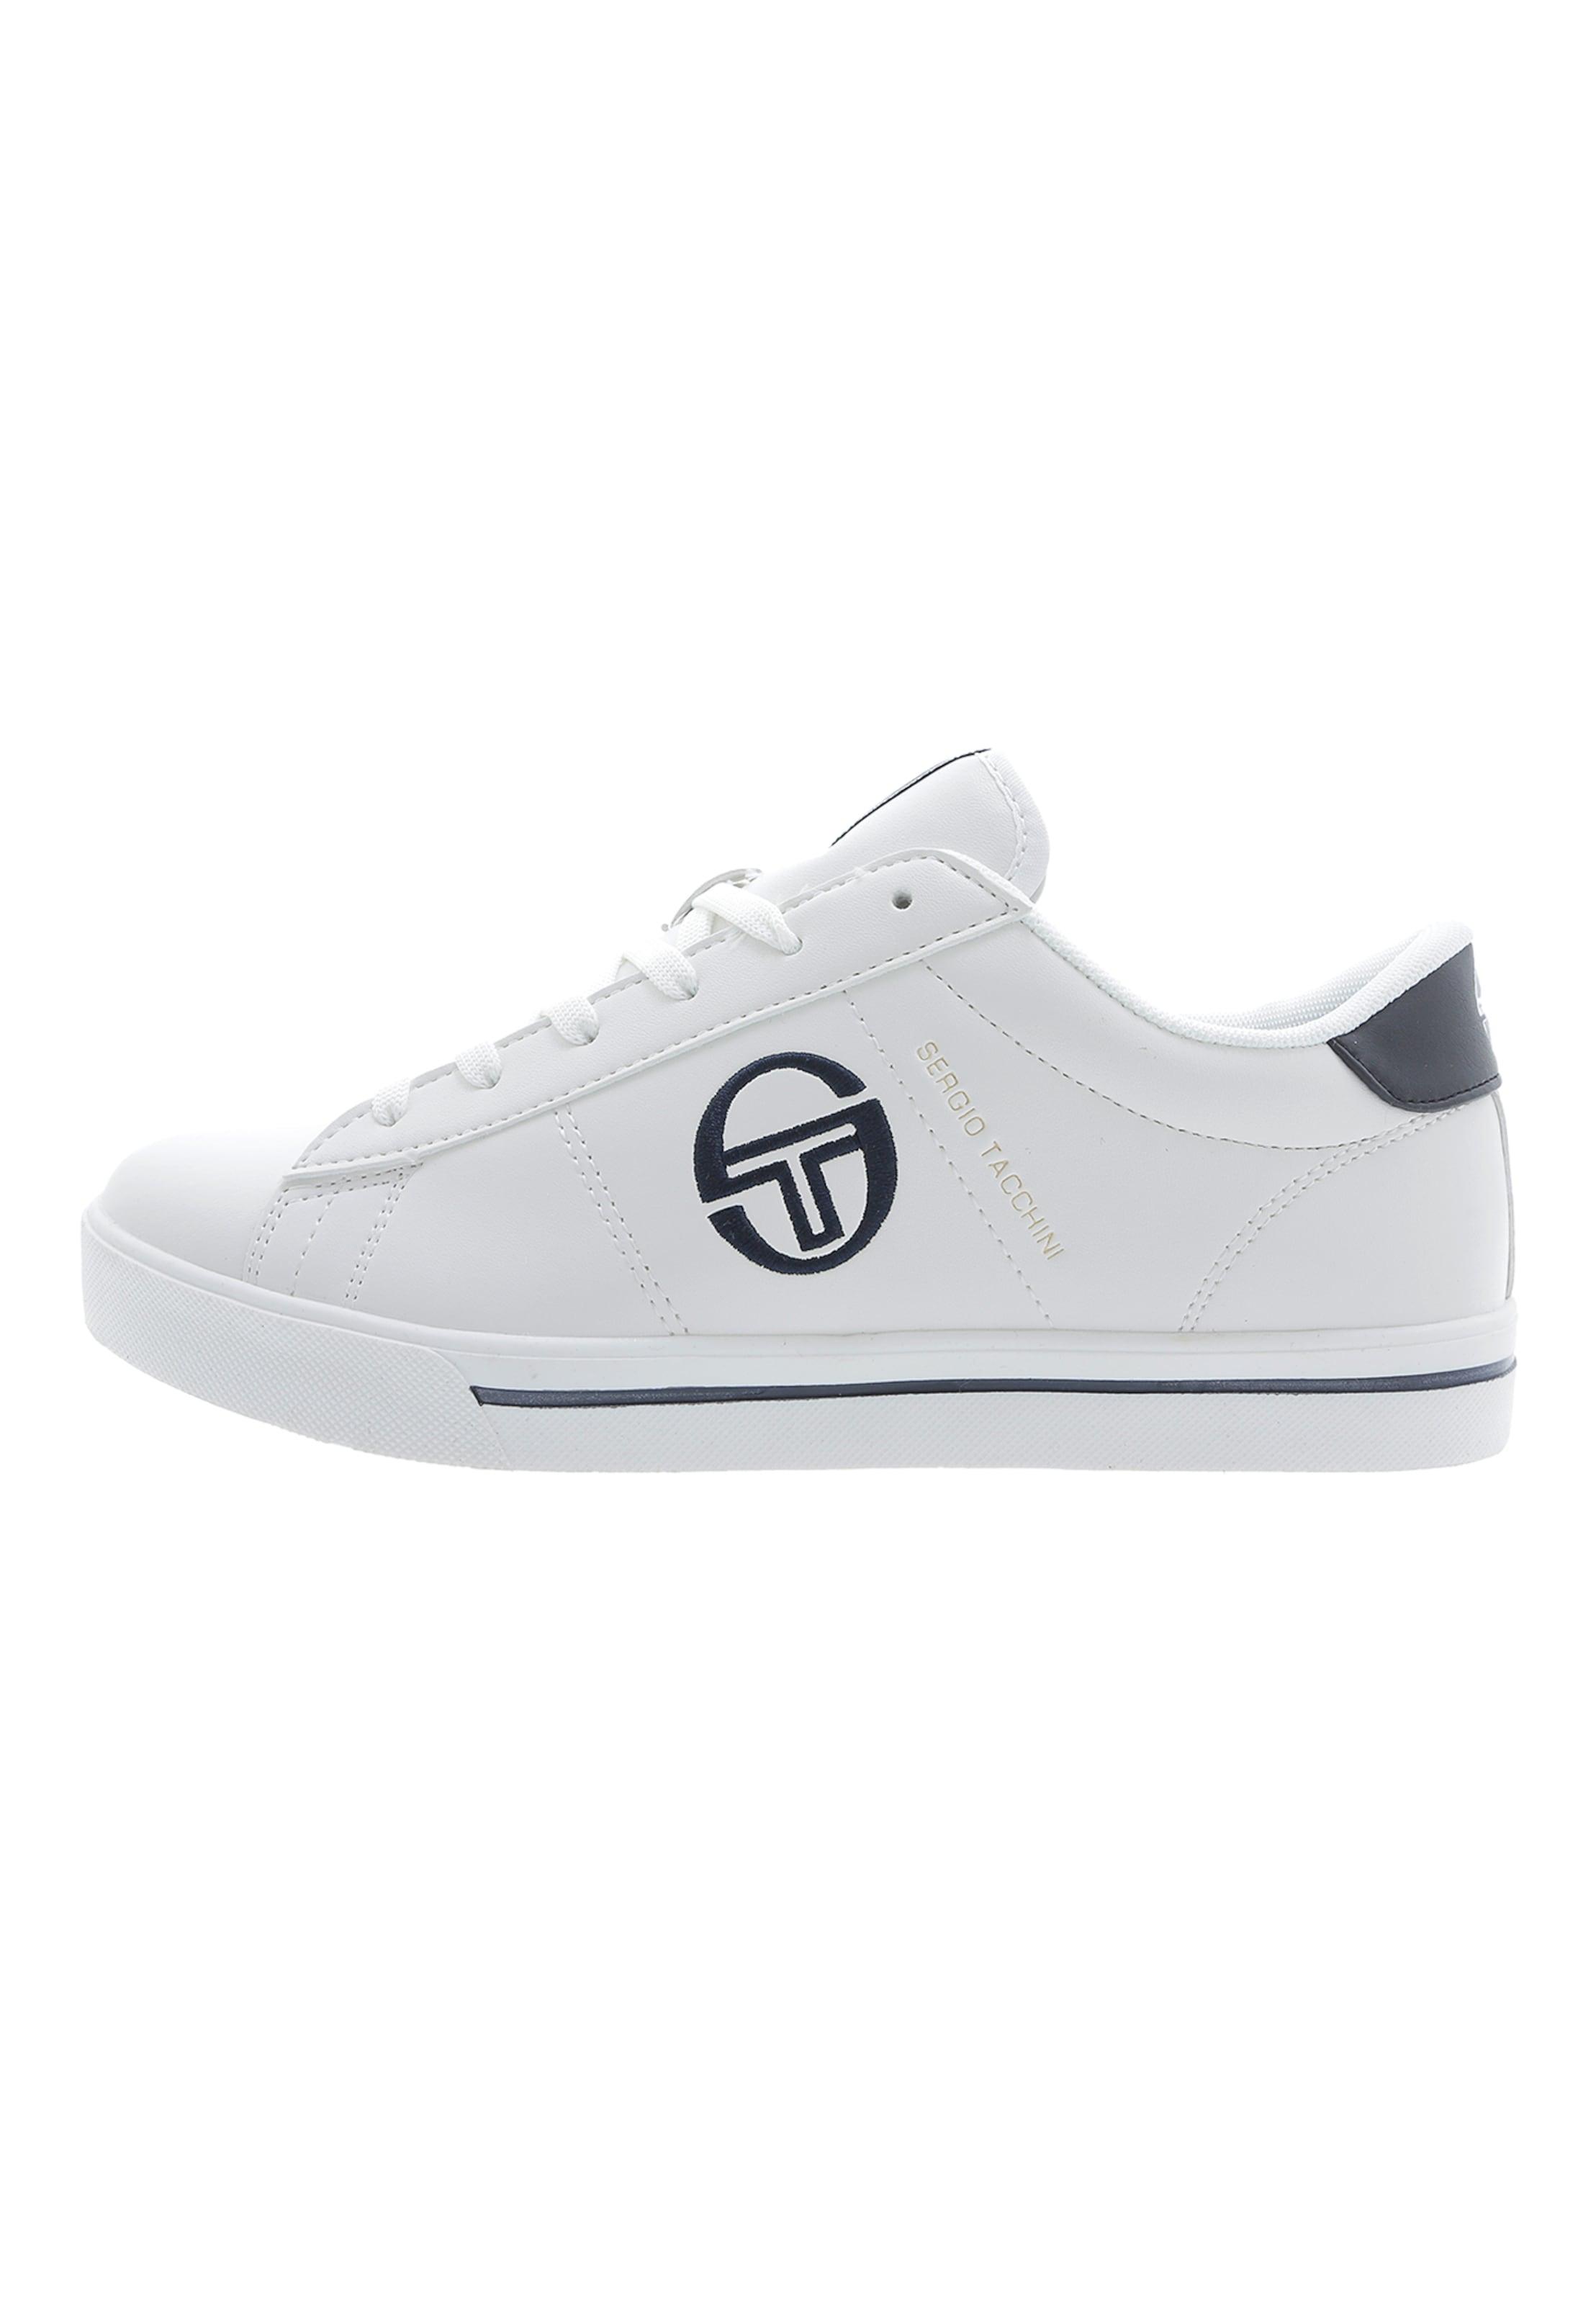 In Weiß 'now Sneaker Sergio Tacchini Low Ltx' tQCBsodxhr